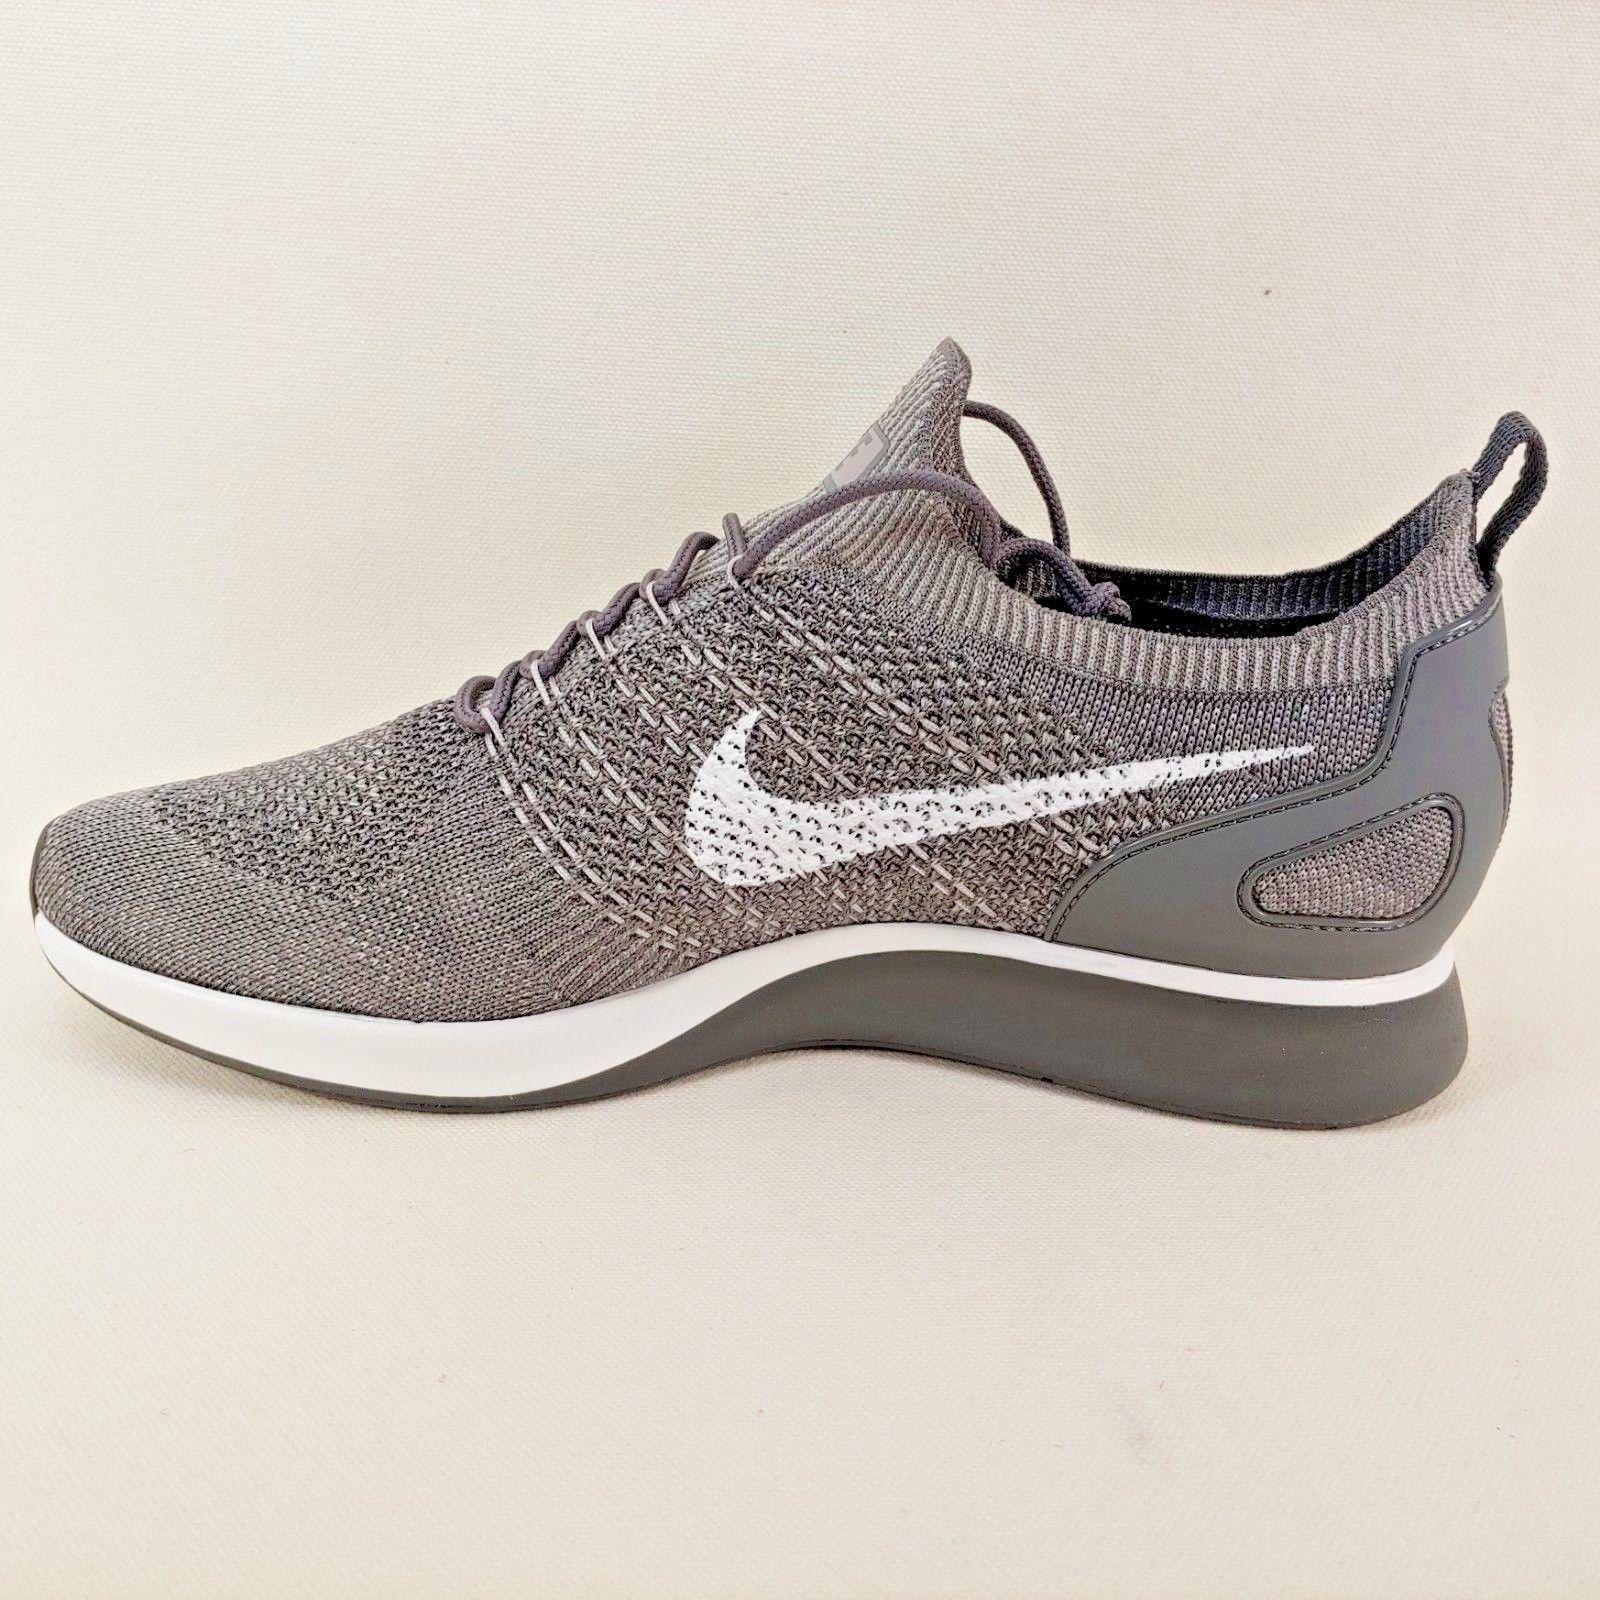 5e2ab30452bb1 ... Nike Air Zoom Mariah Flyknit Racer Gunsmoke Grey Running Shoe Size 11  ...